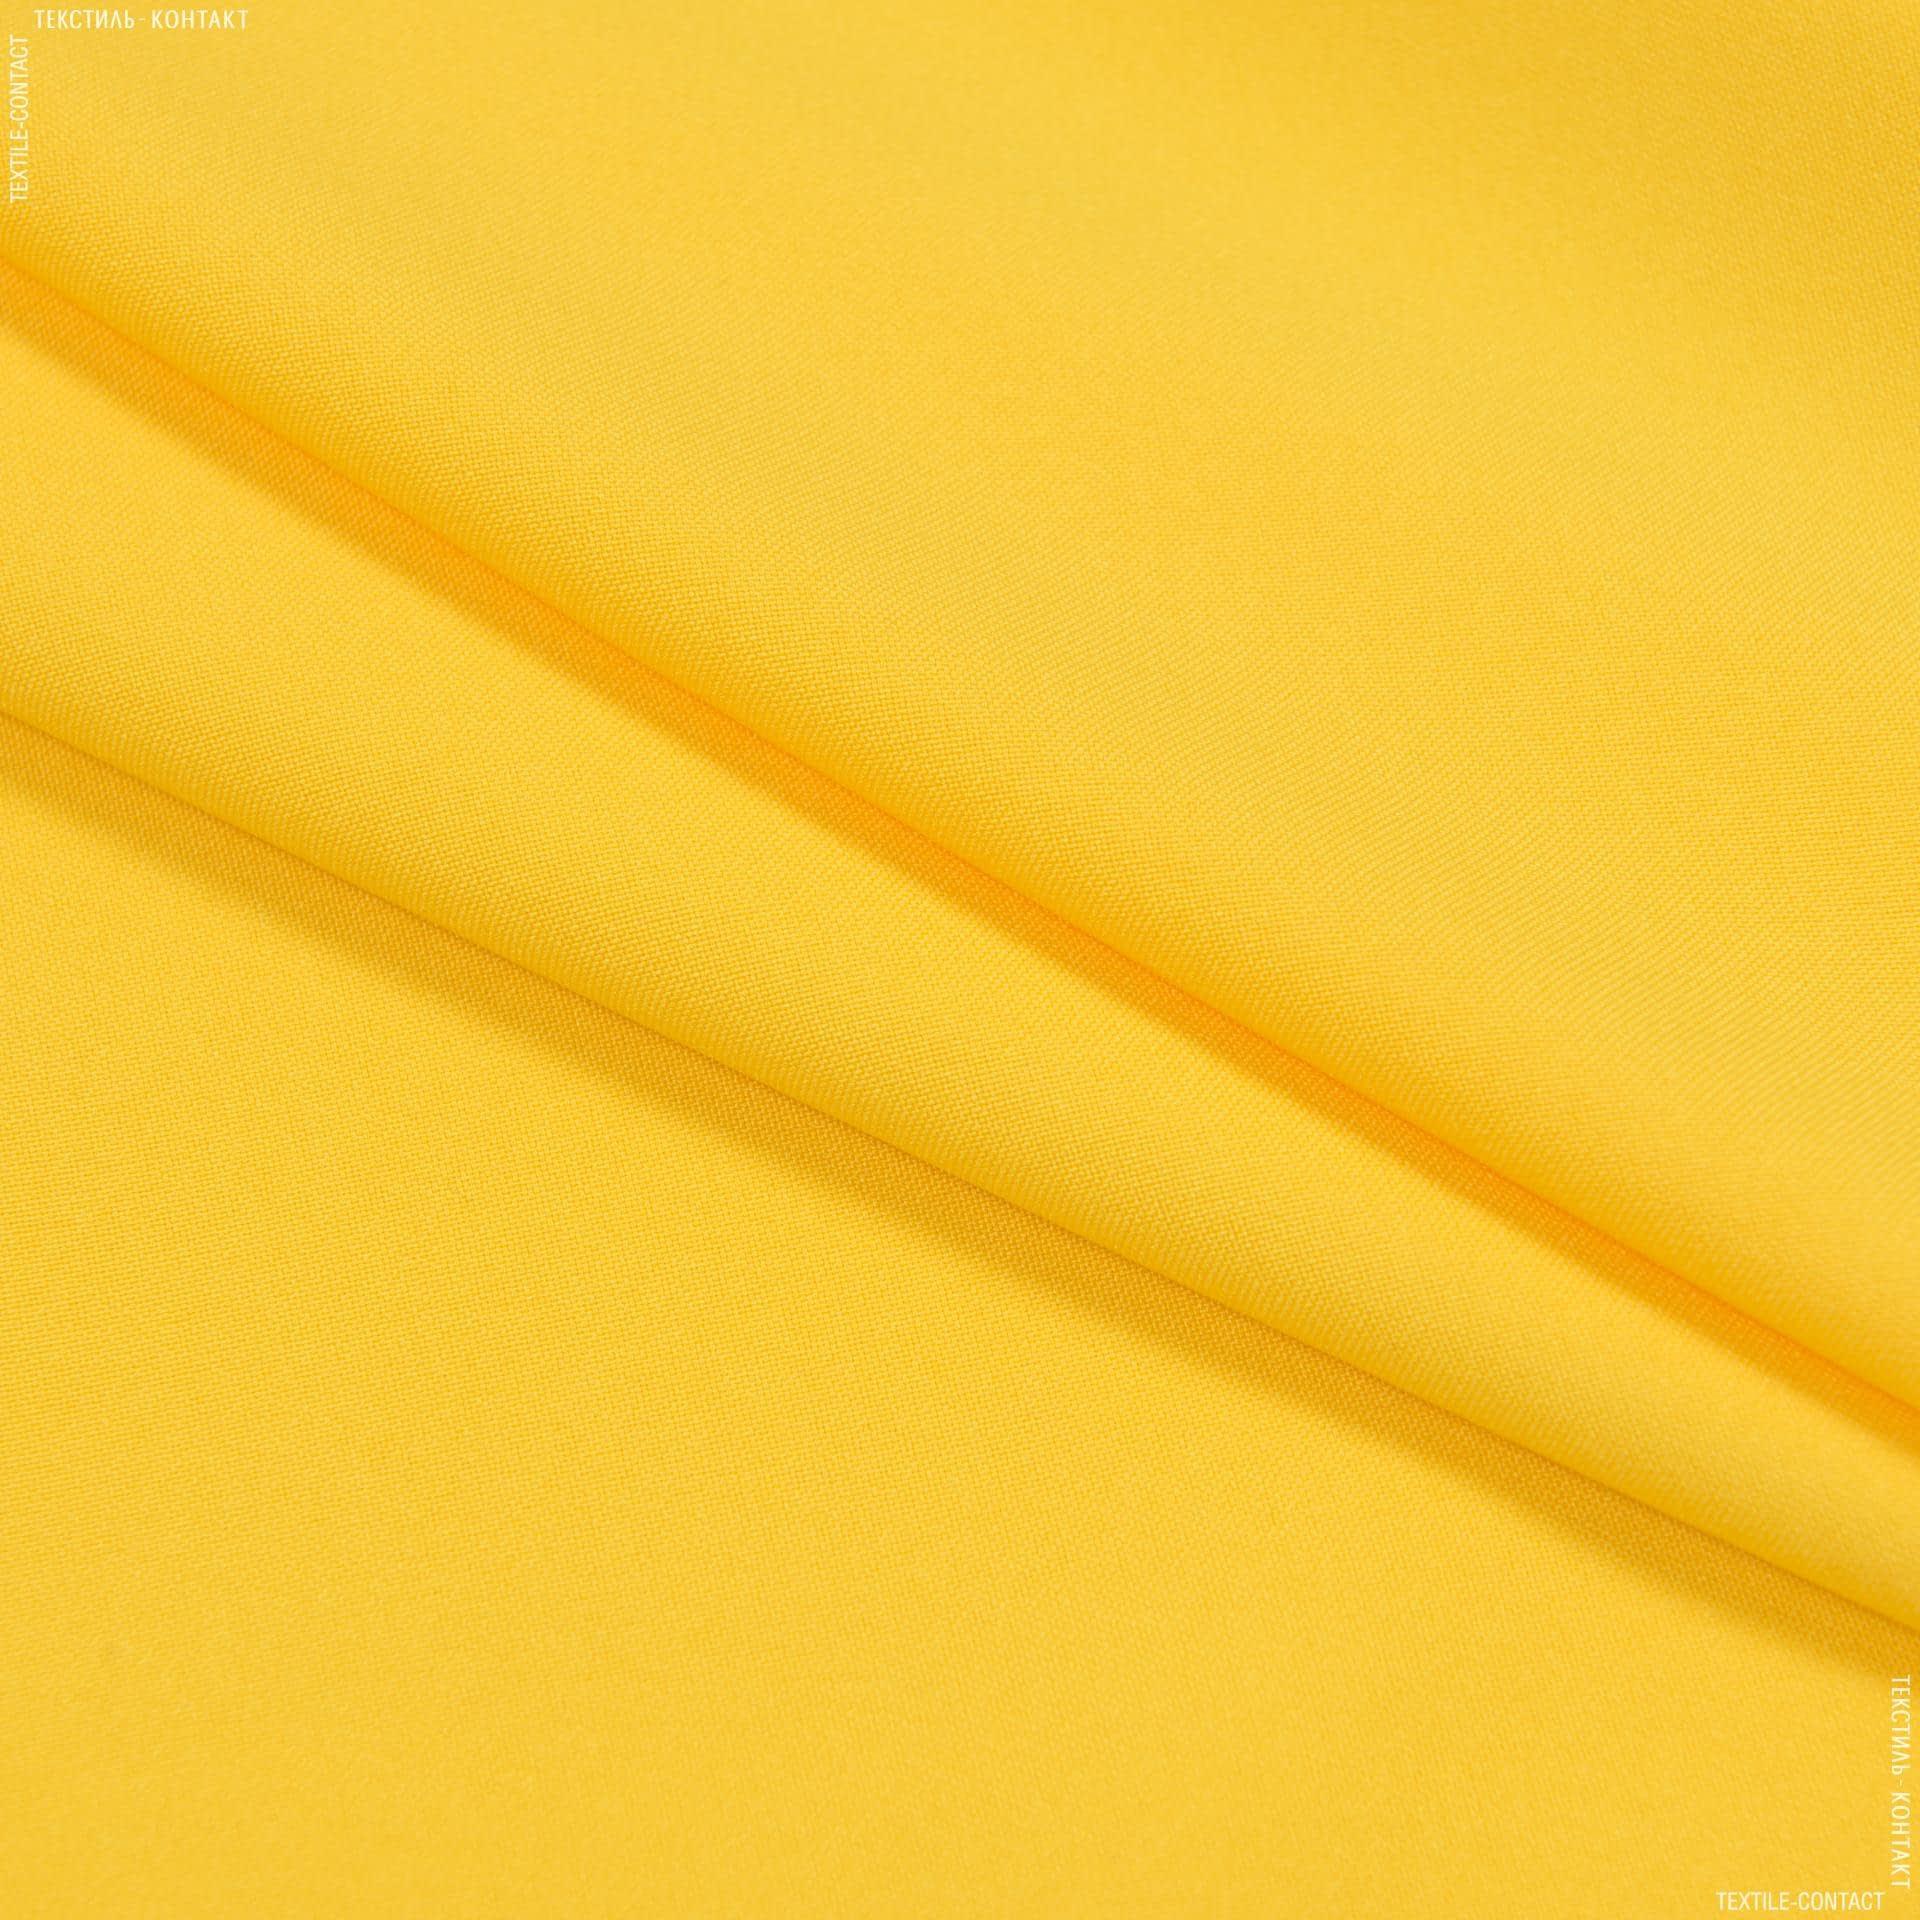 Ткани для спецодежды - Габардин желтый